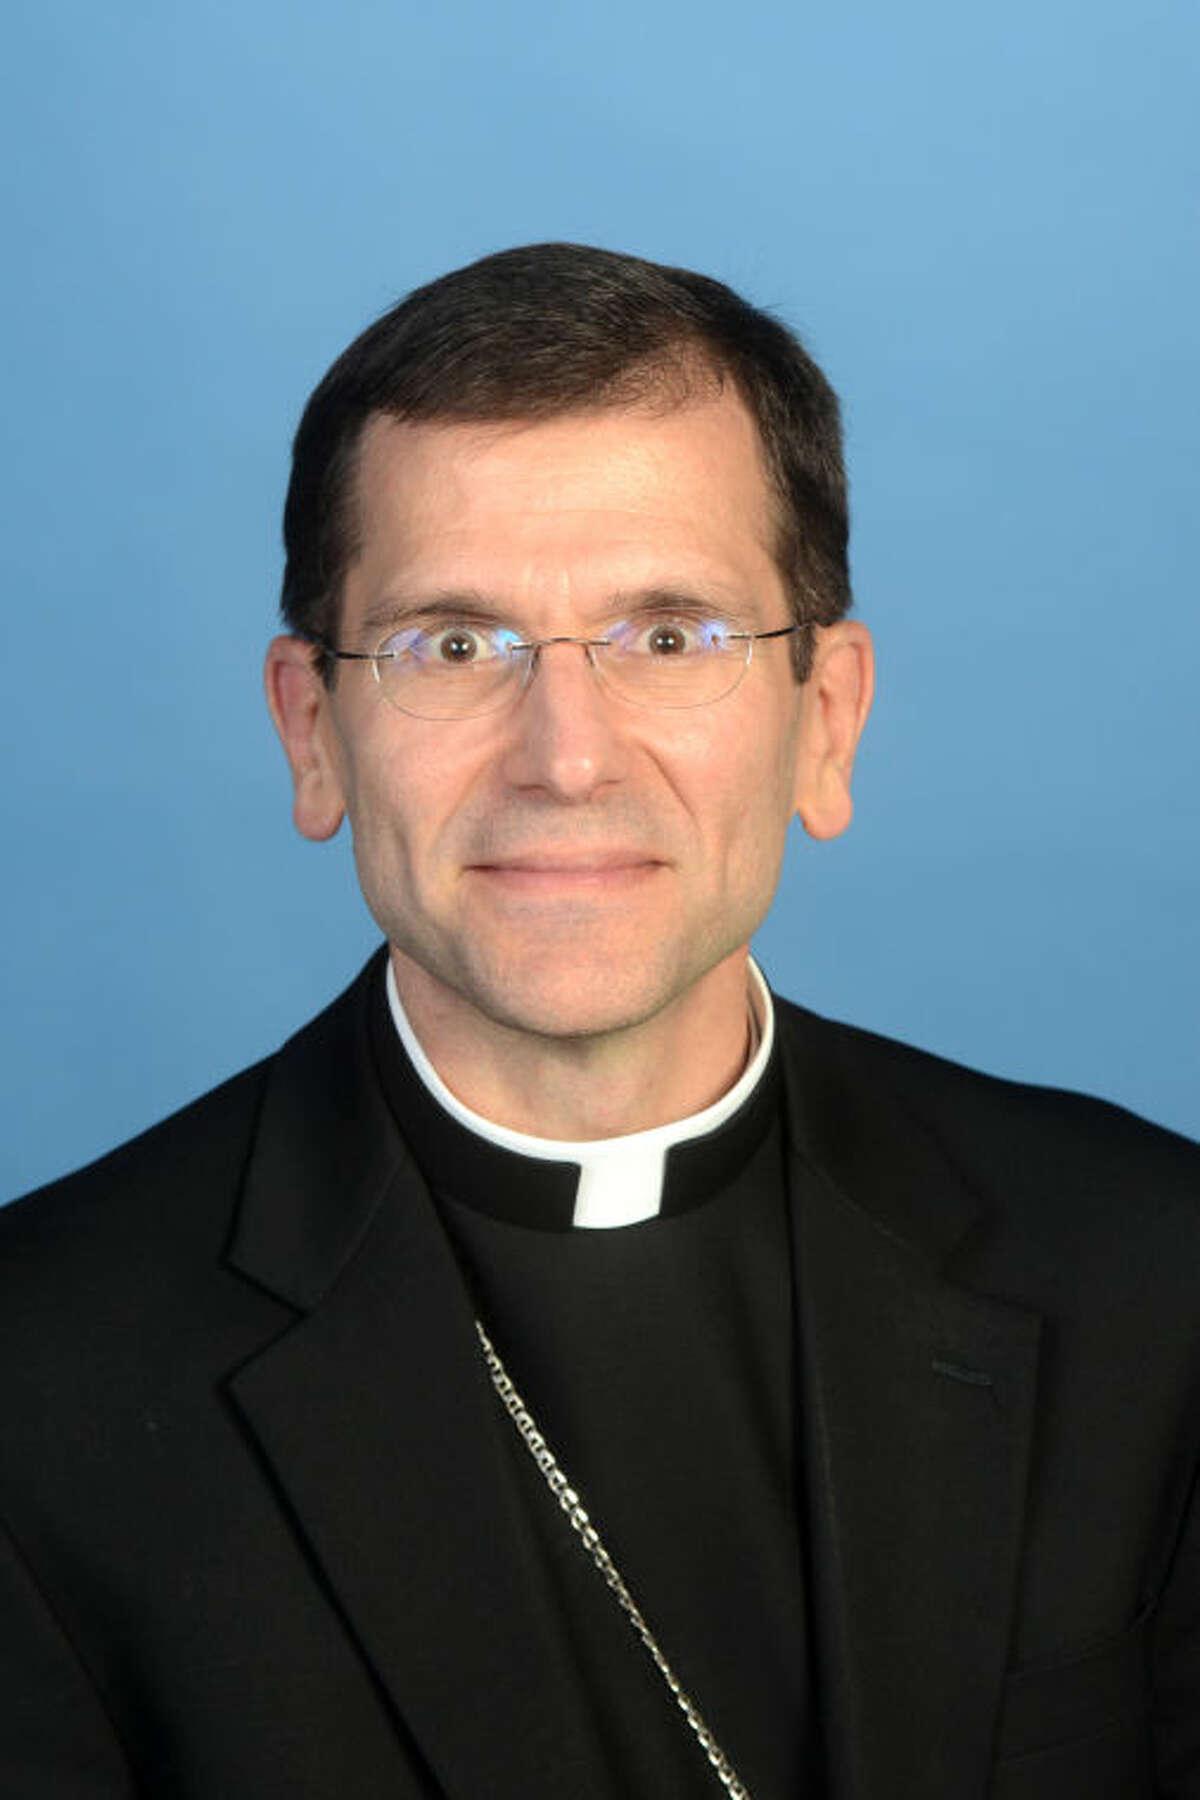 Bishop of the Catholic Diocese of San Angelo, Michael Sis. James Durbin/Reporter-Telegram